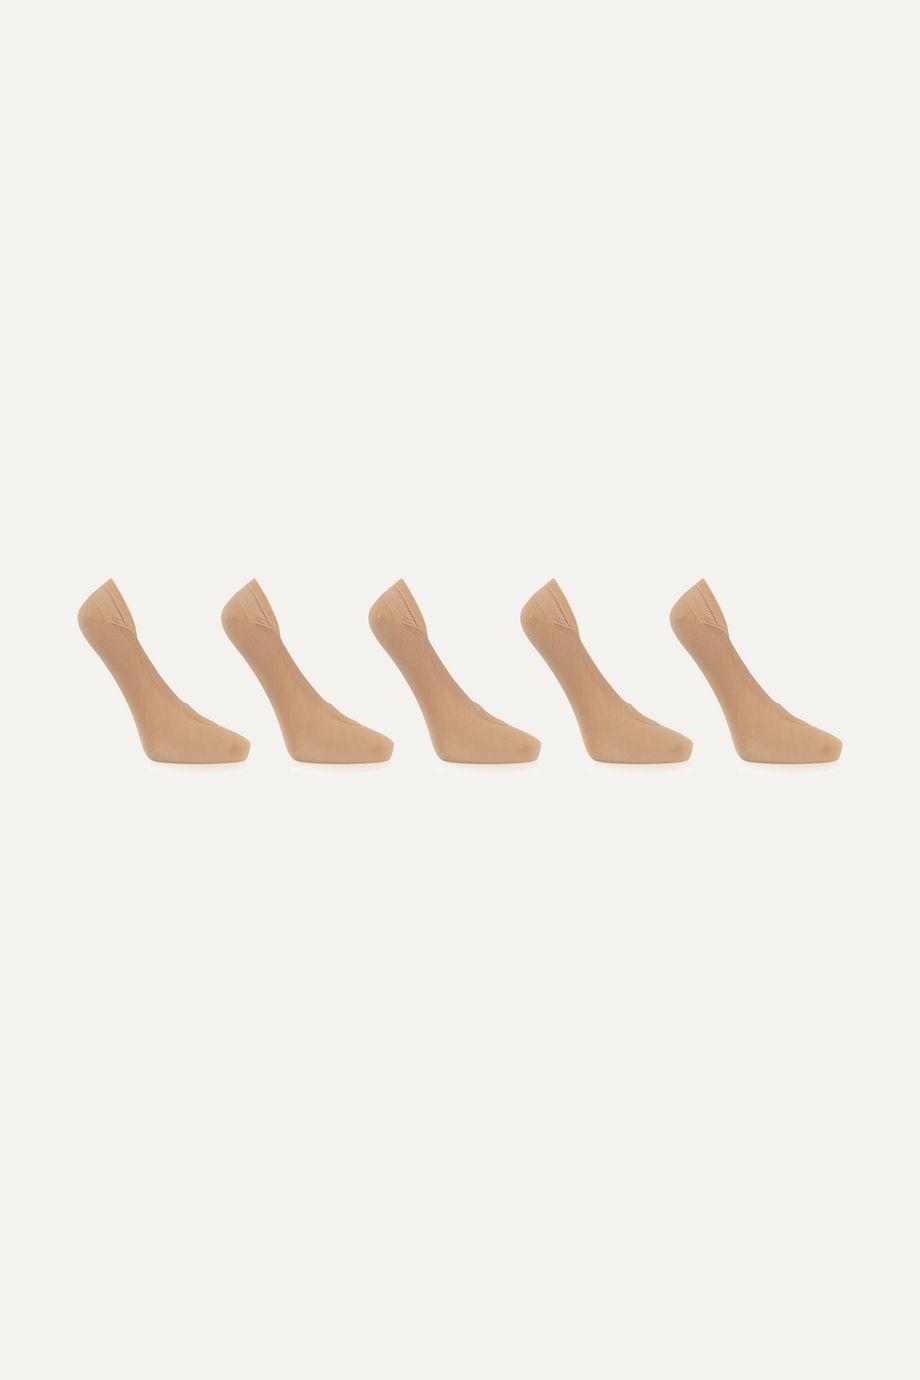 FALKE Cotton Step 针织船袜(五双装)